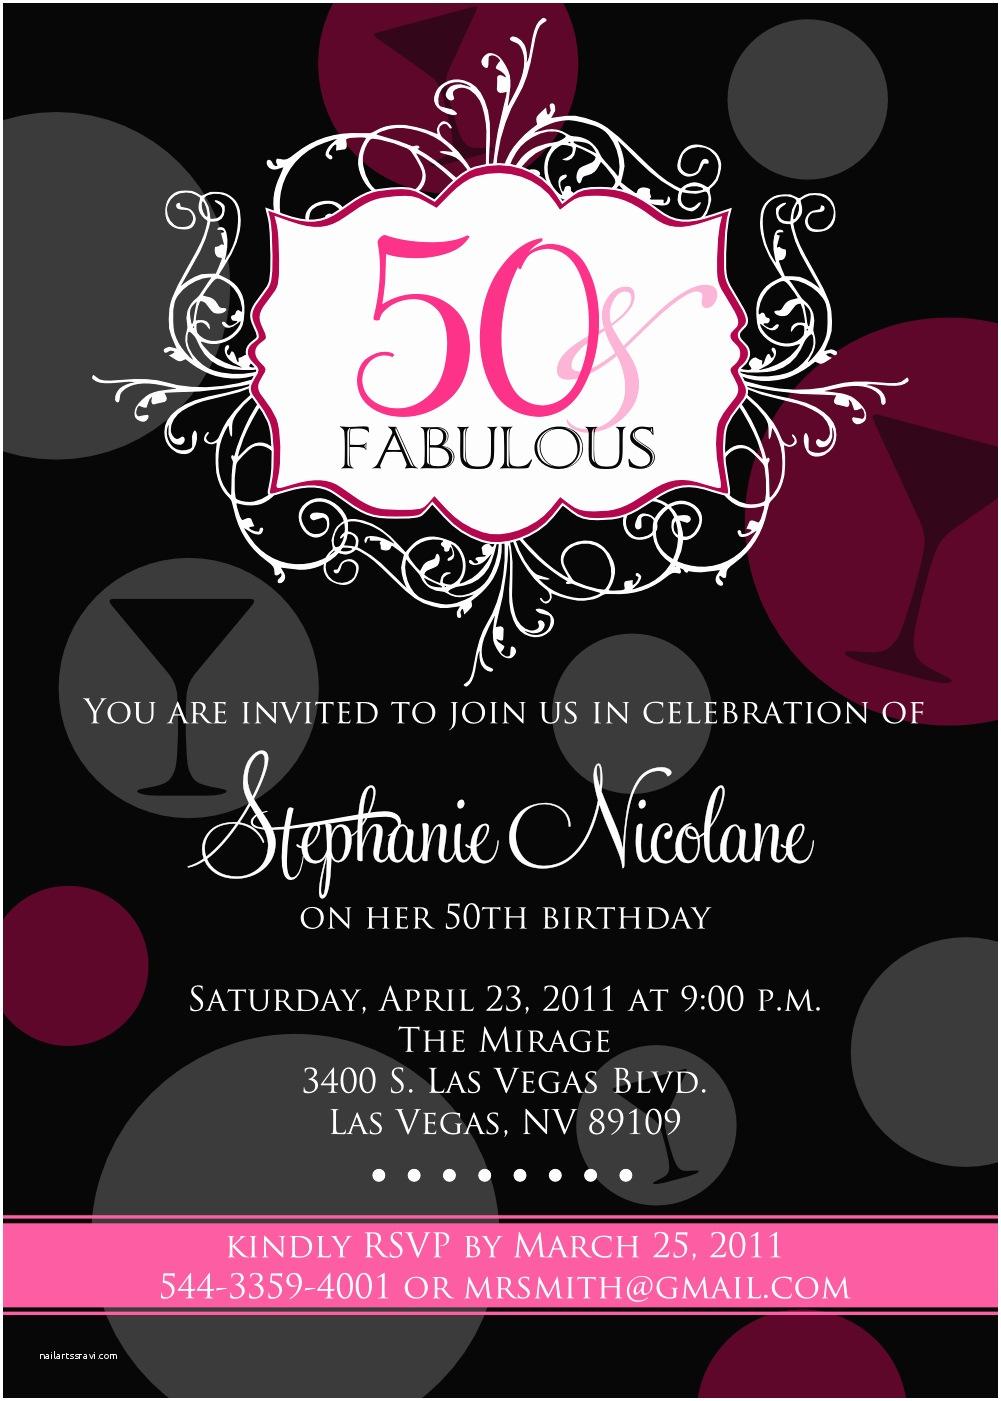 50th Birthday Invitations 50th Birthday Beach Party Invitations